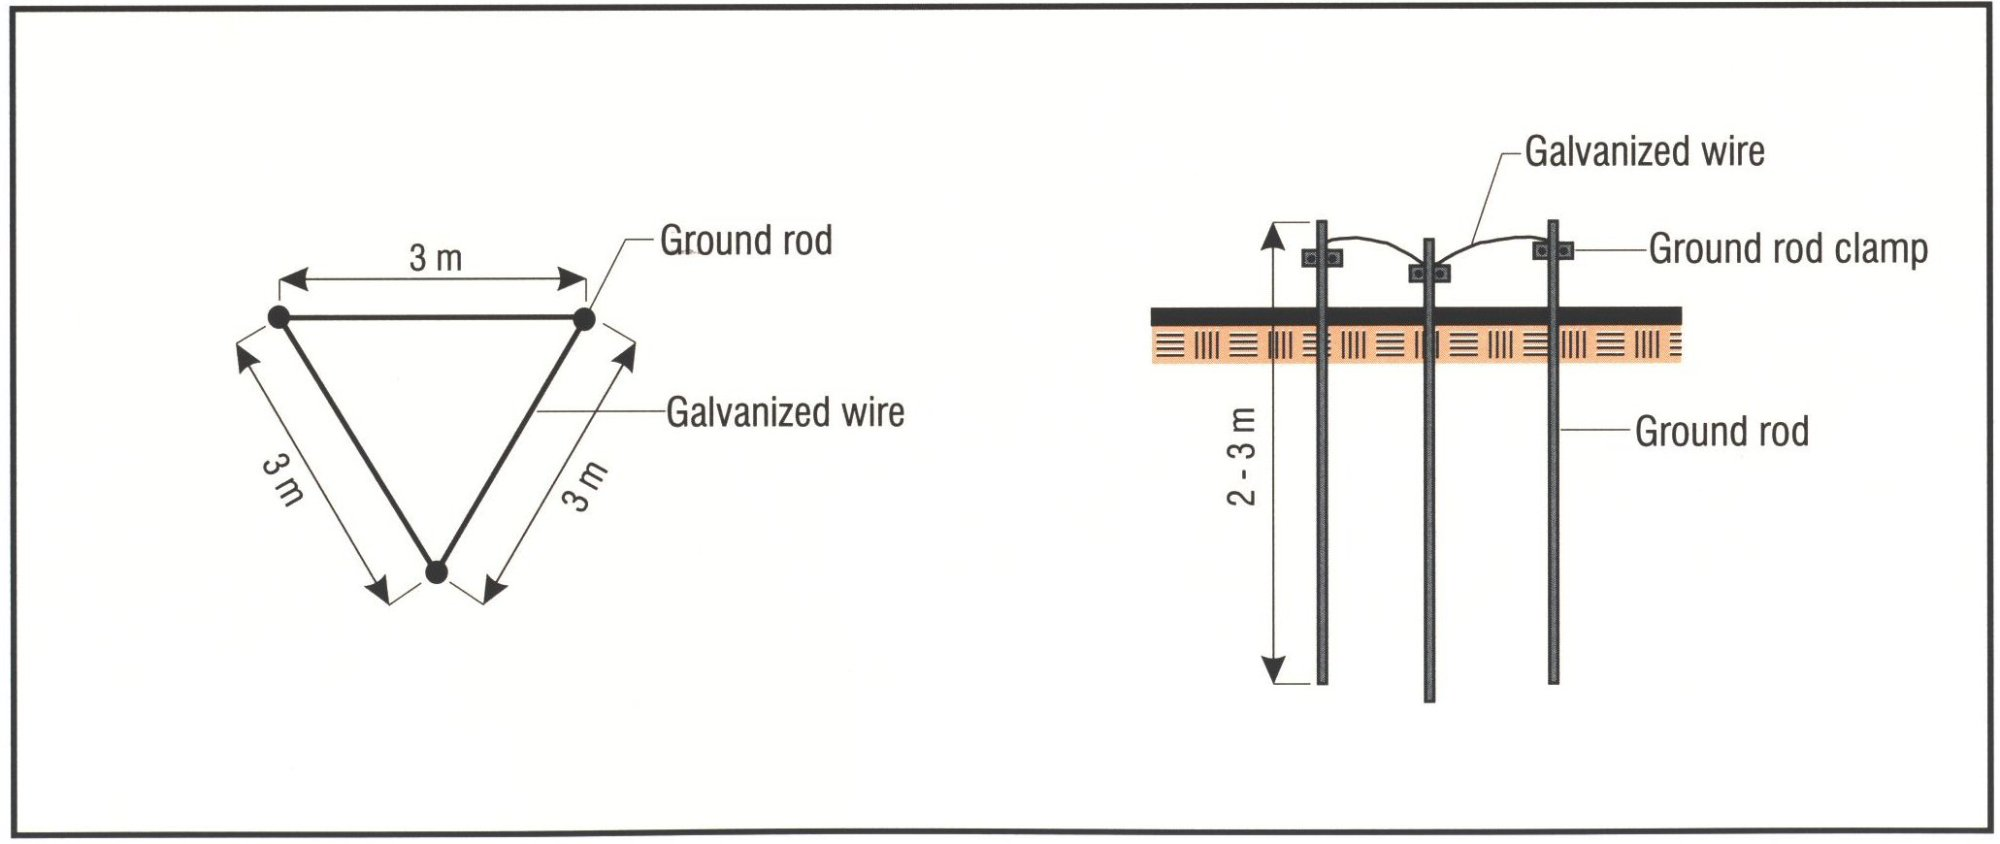 hight resolution of using galvanized materials